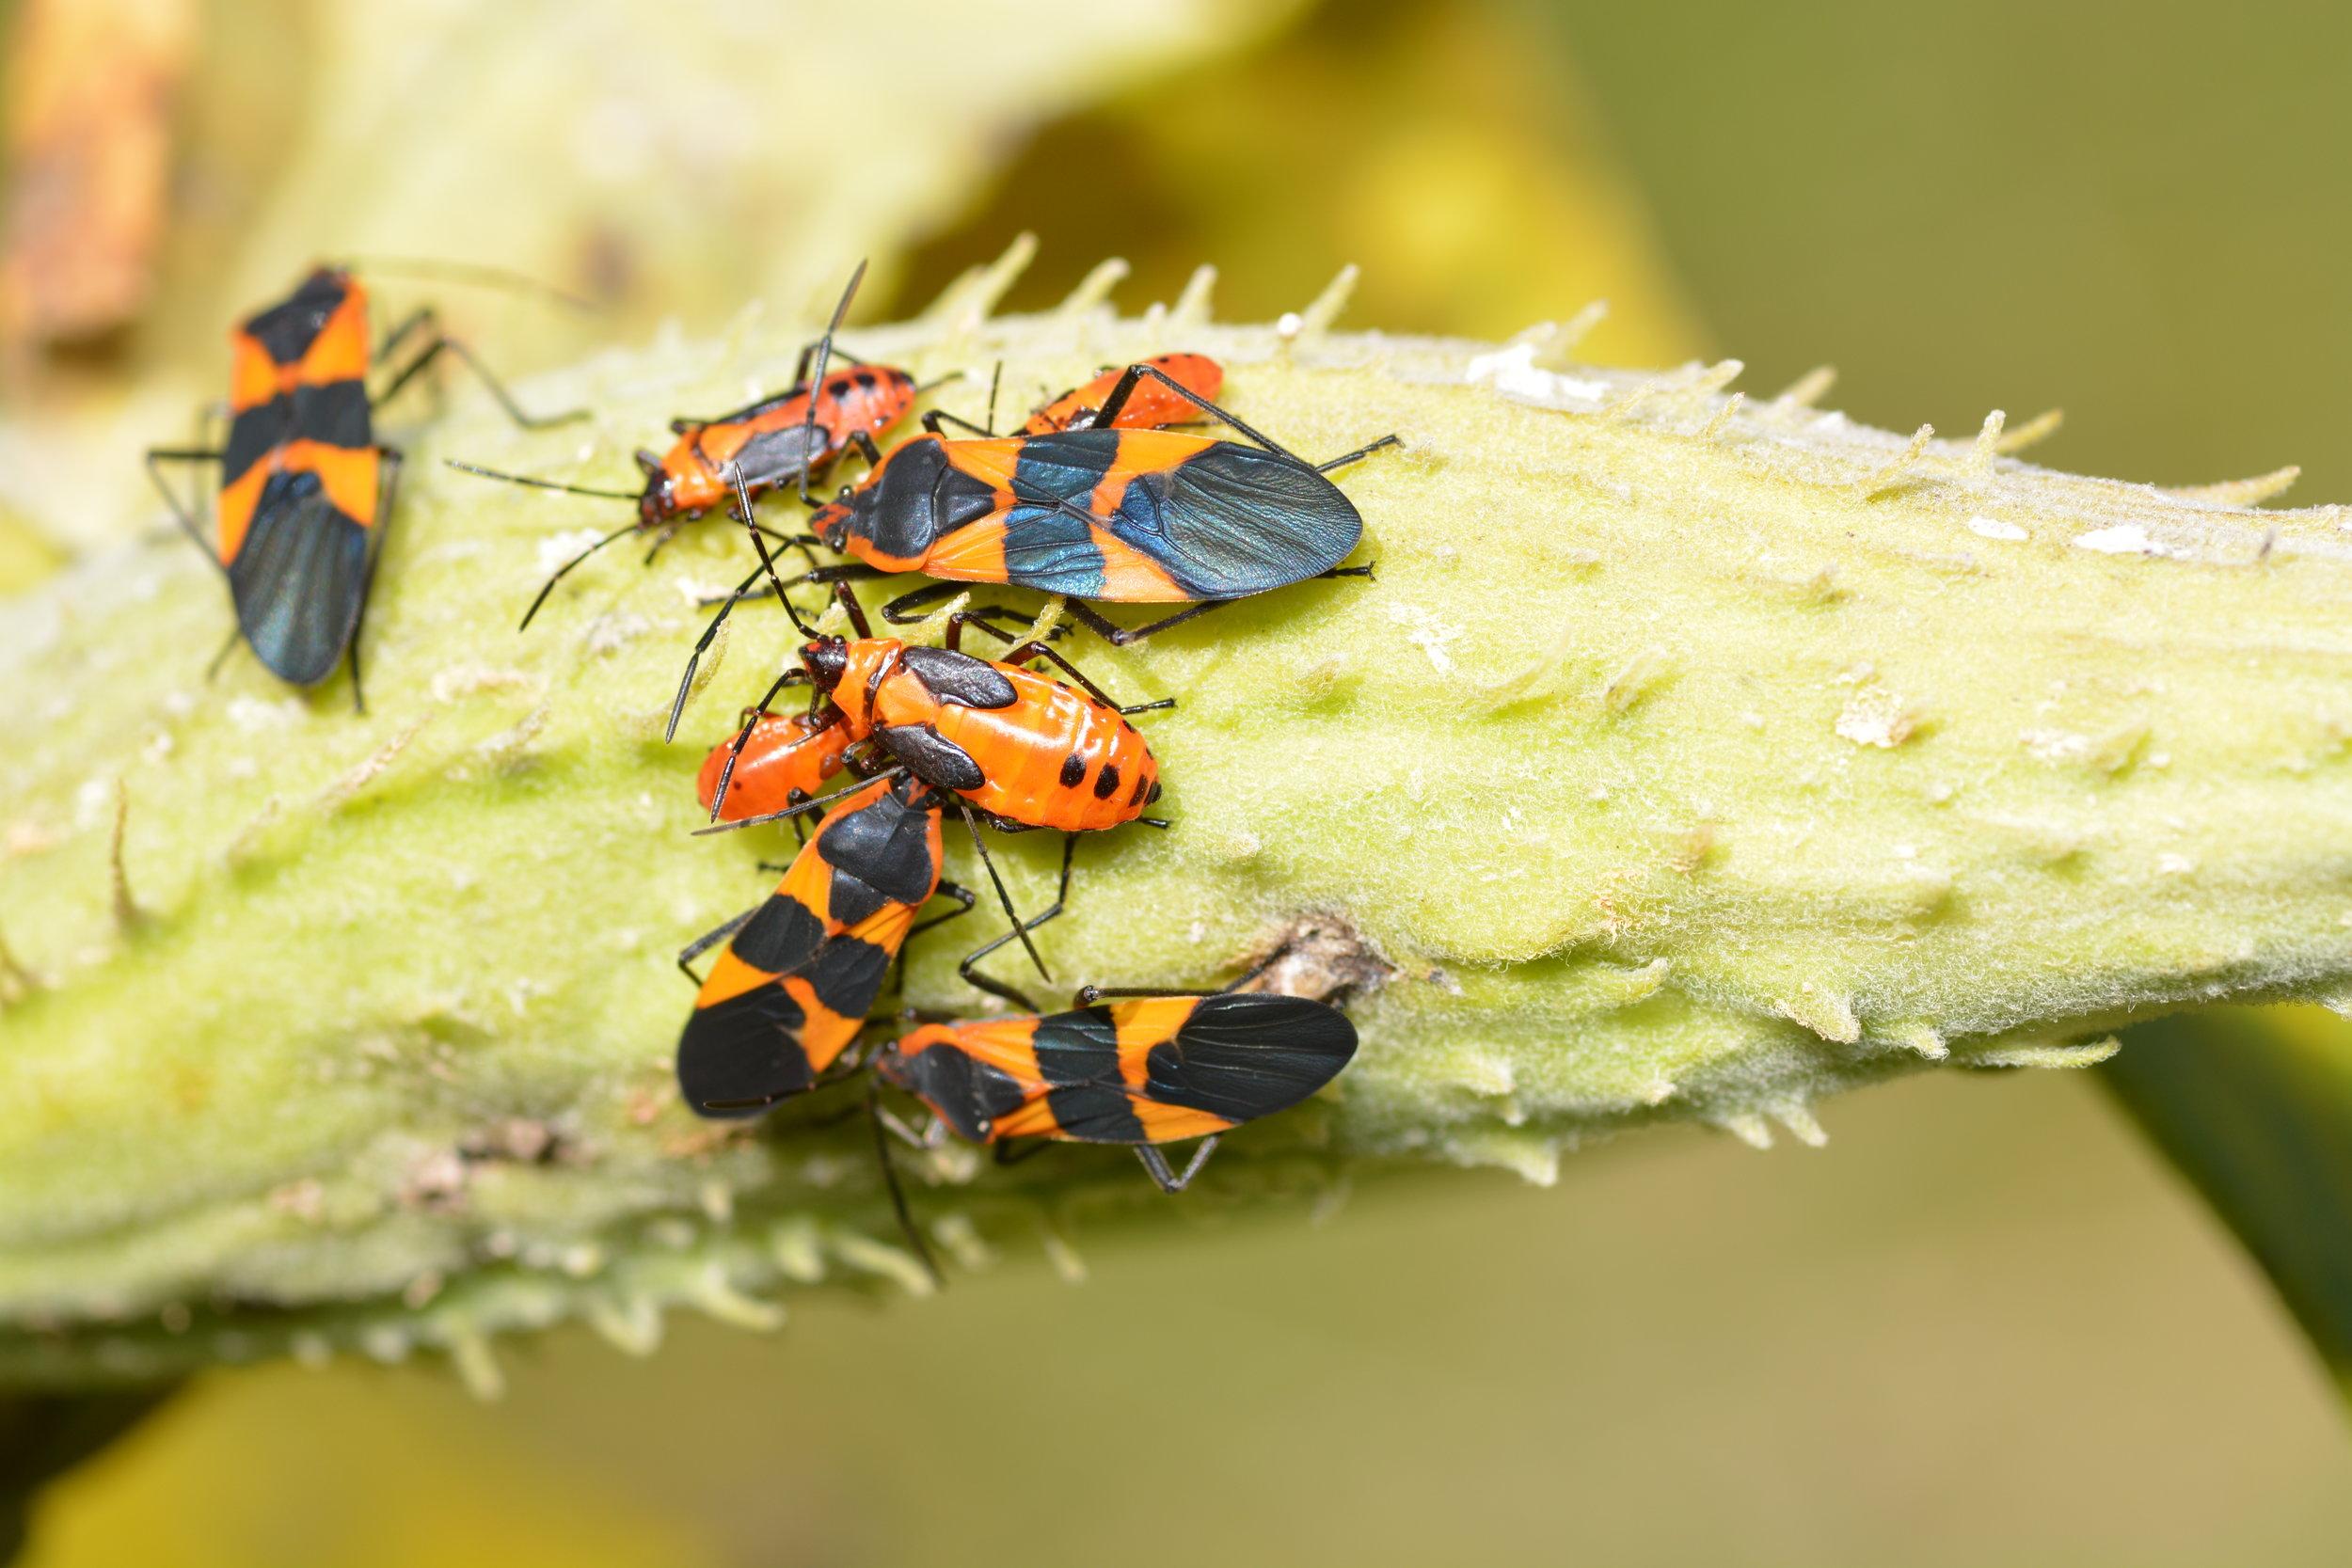 Milkweed Bugs - Oncopeltus fasciatus, Order: Hemiptera